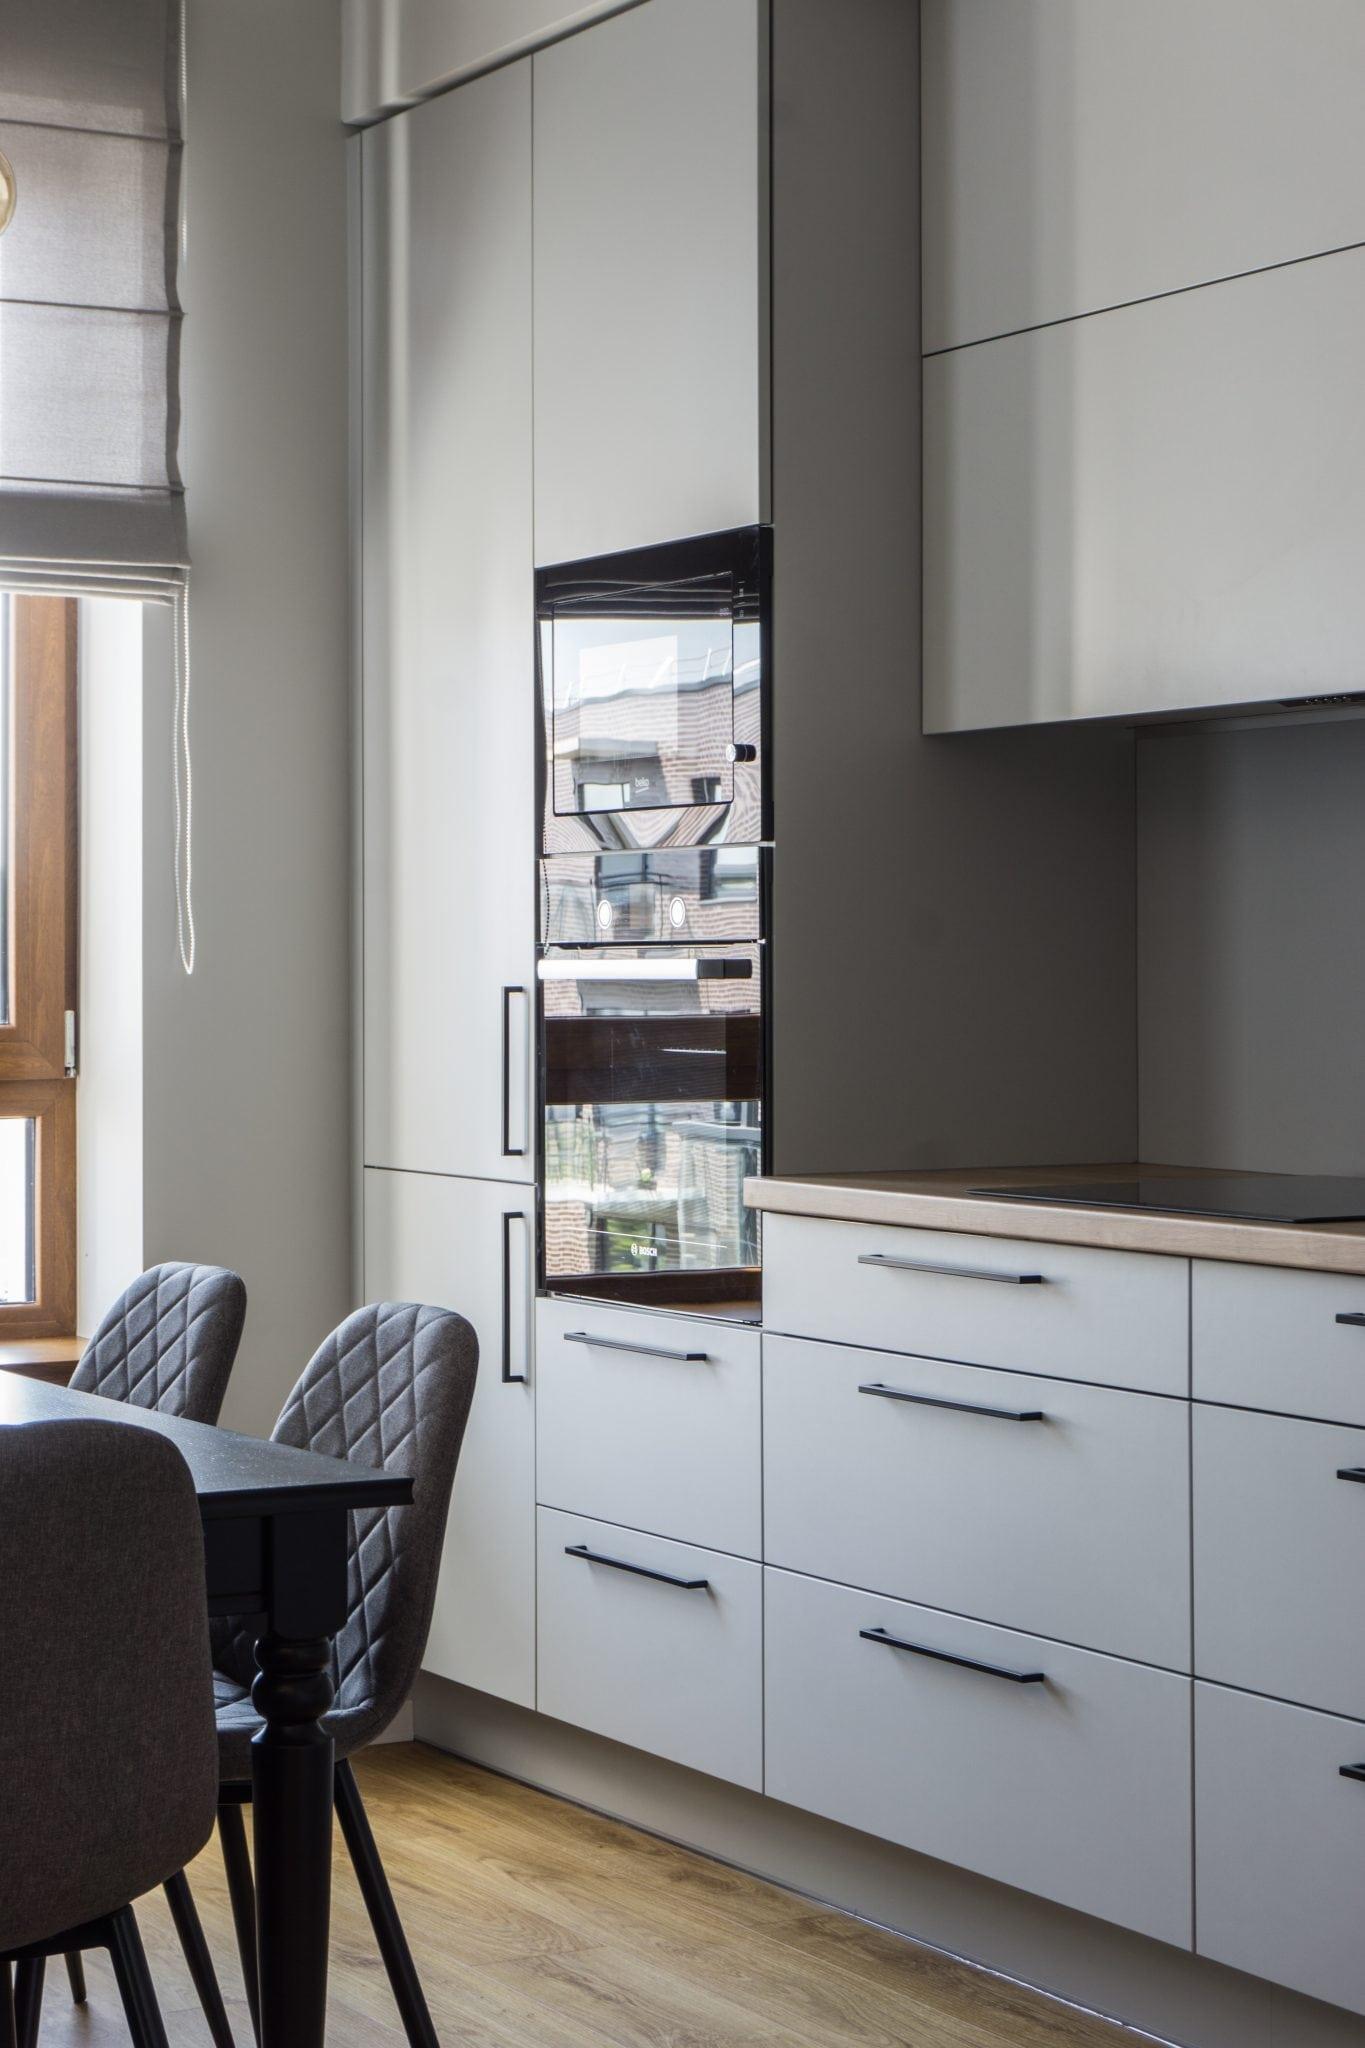 Virtuves baldai nestandartiniu baldu gamyba